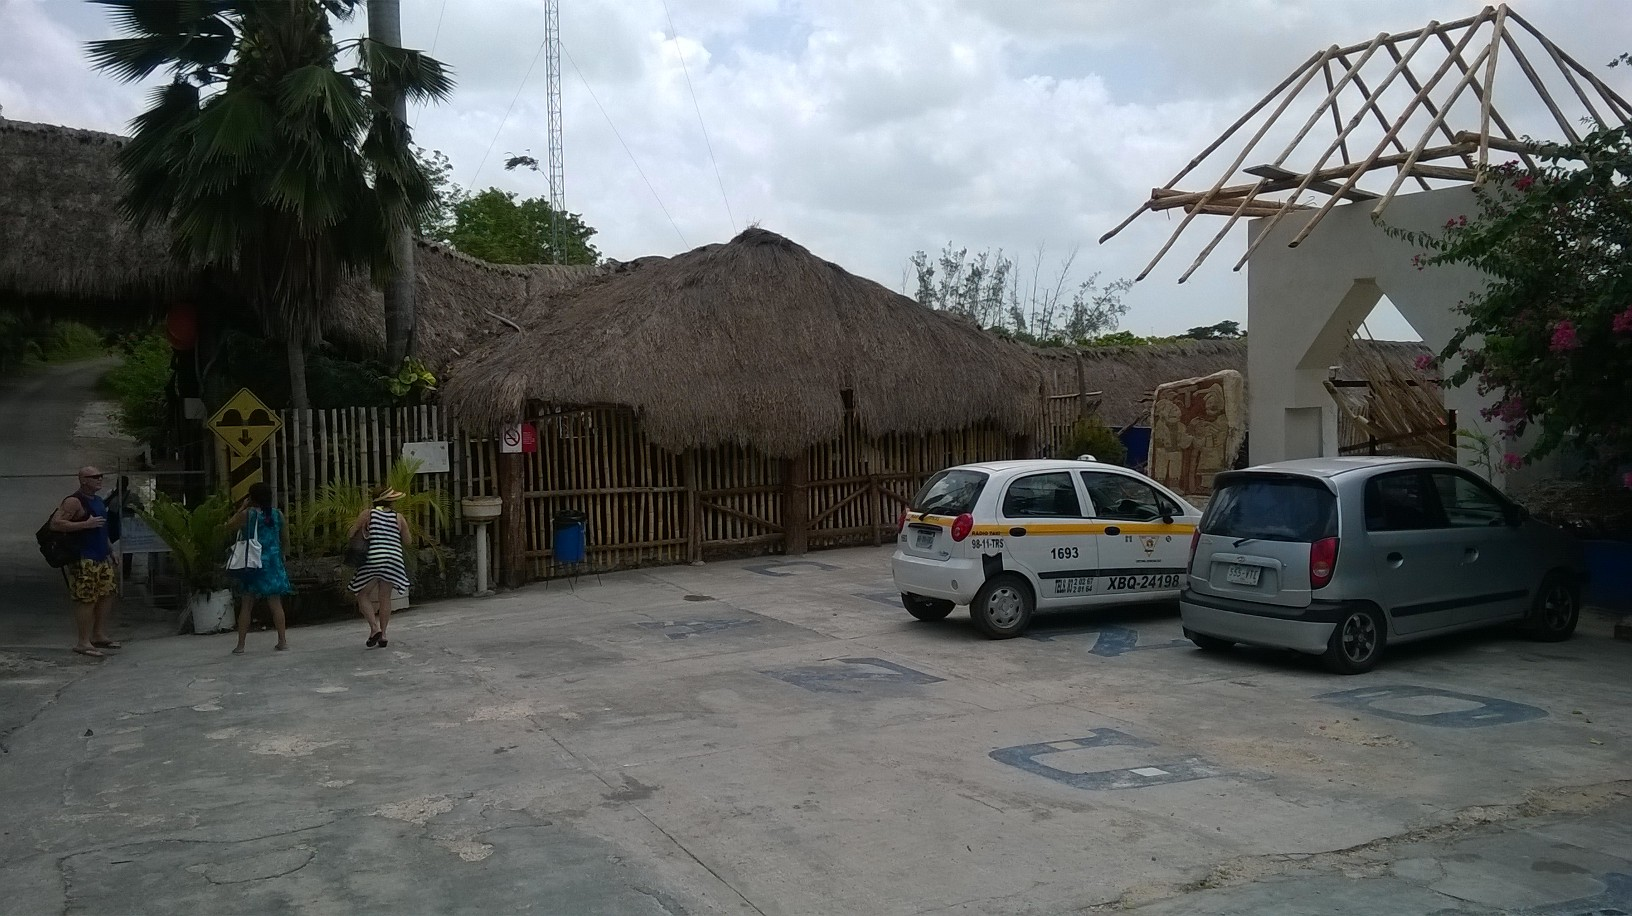 bacalar cenote azul entrance park jul14